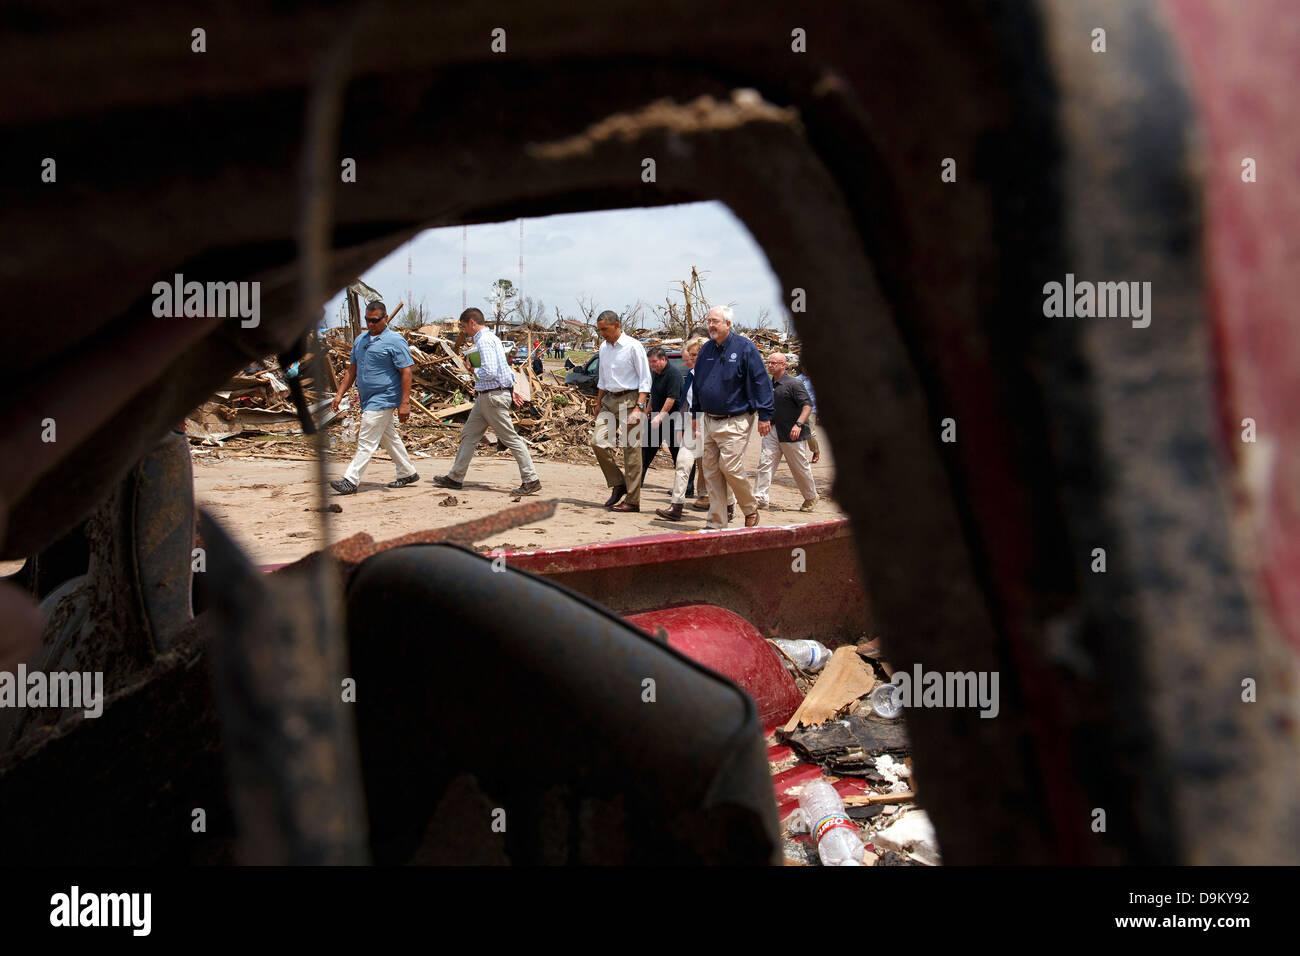 US President Barack Obama tours tornado damage along a block of Eagle Drive May 26, 2013 in Moore, OK. Oklahoma - Stock Image